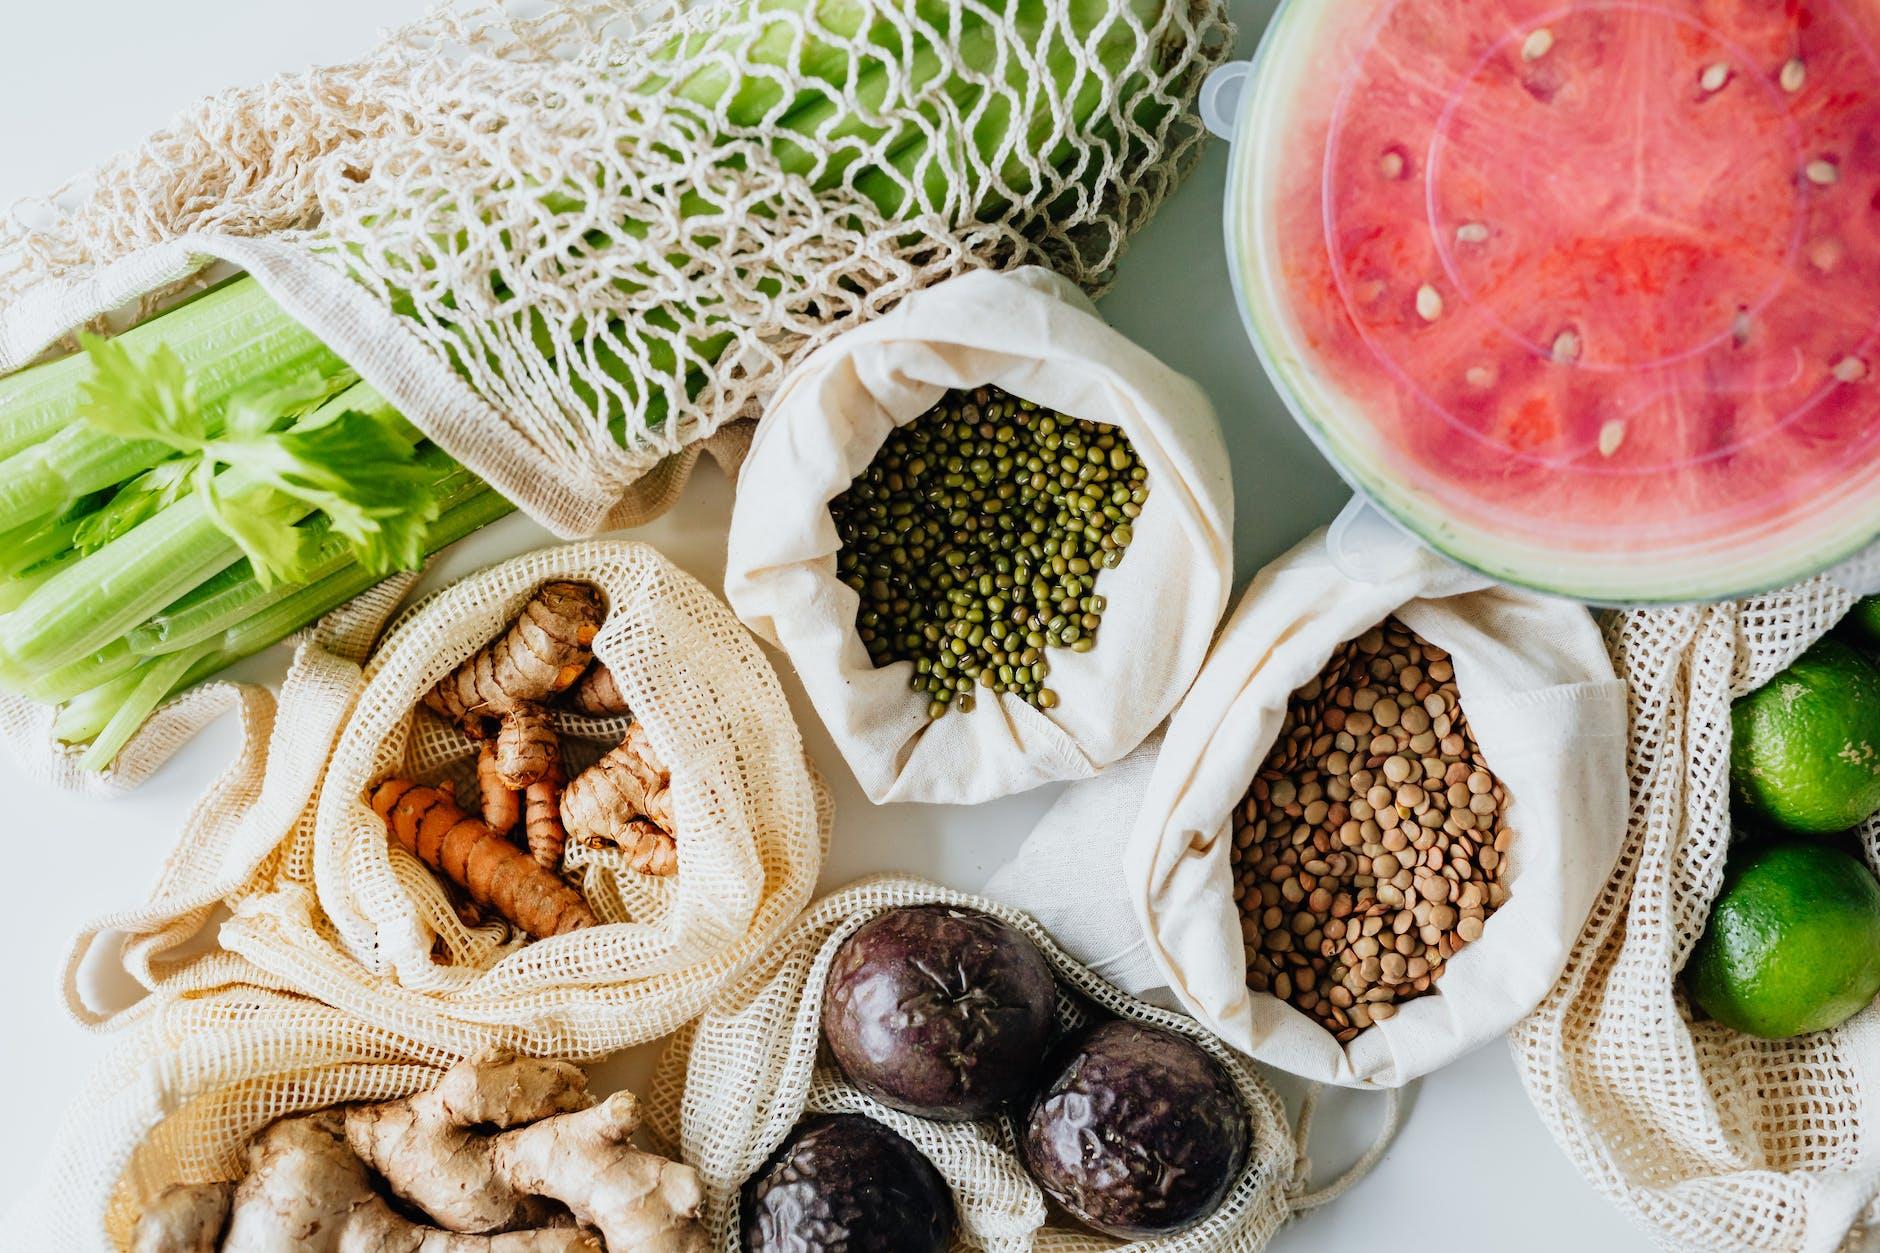 resolusi masak 2021 gunakan lebih banyak sayur dan buah-buahan